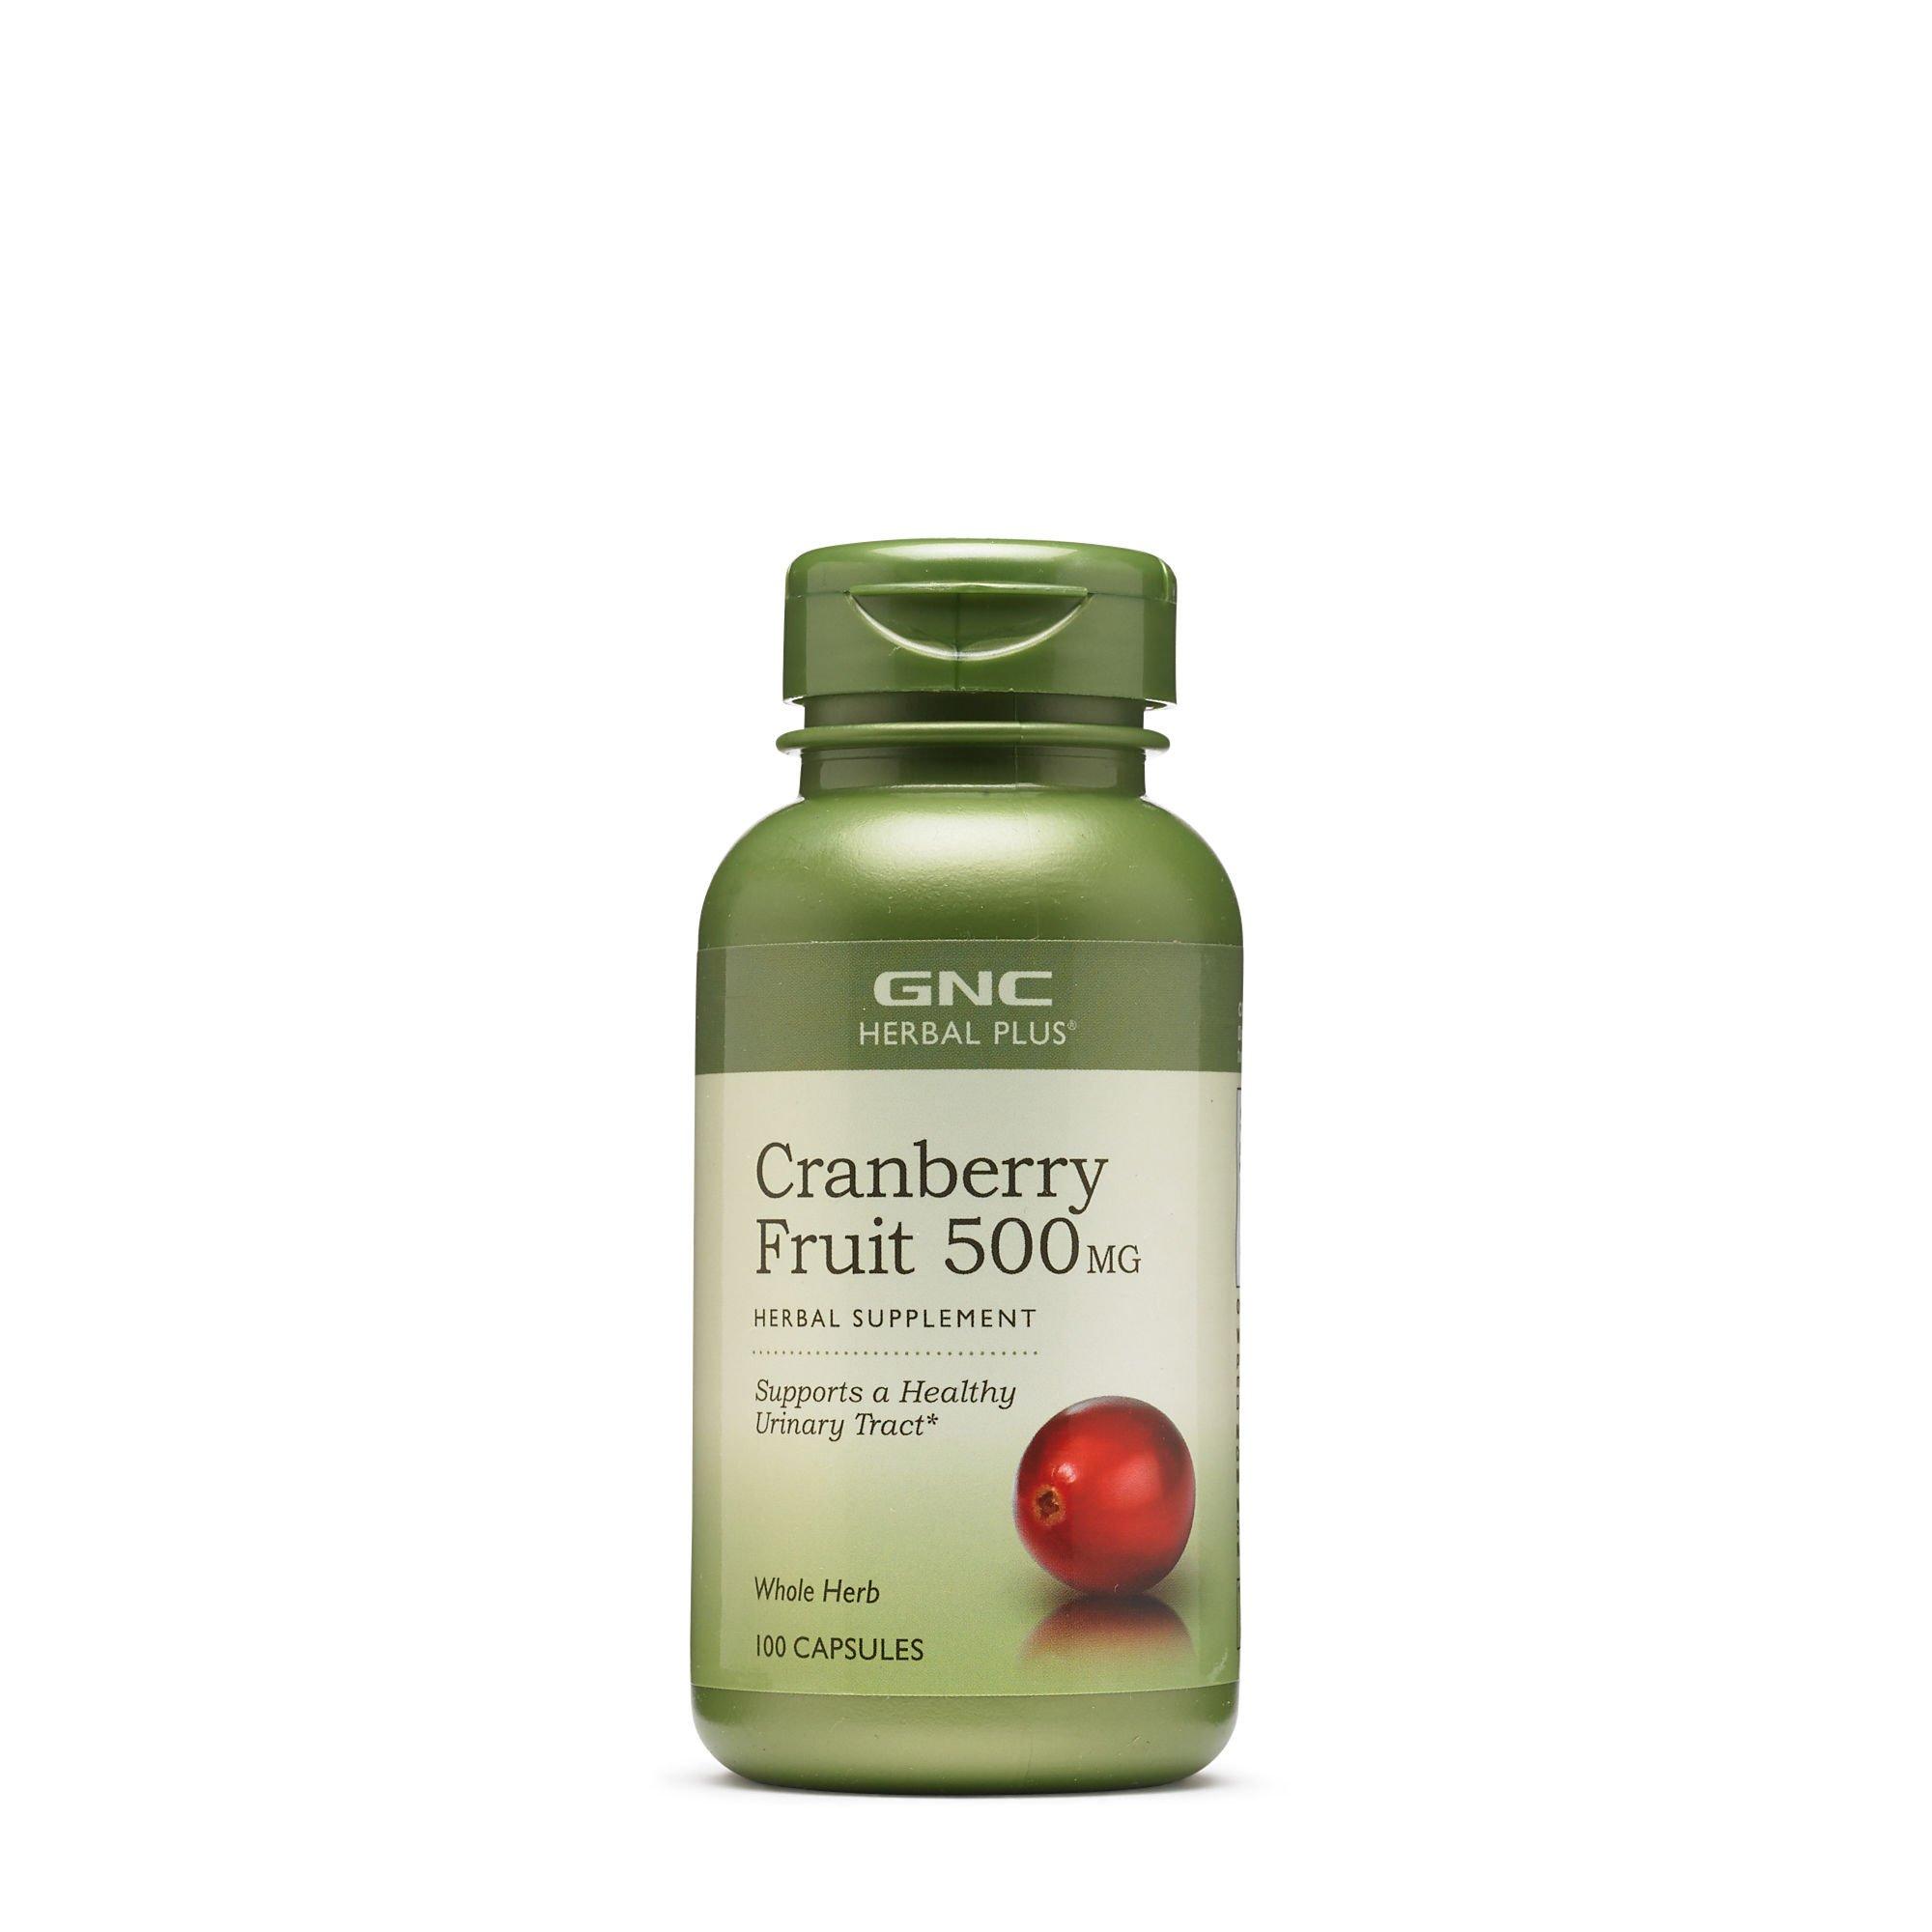 GNC Herbal Plus Cranberry Fruit 500MG 100 caps